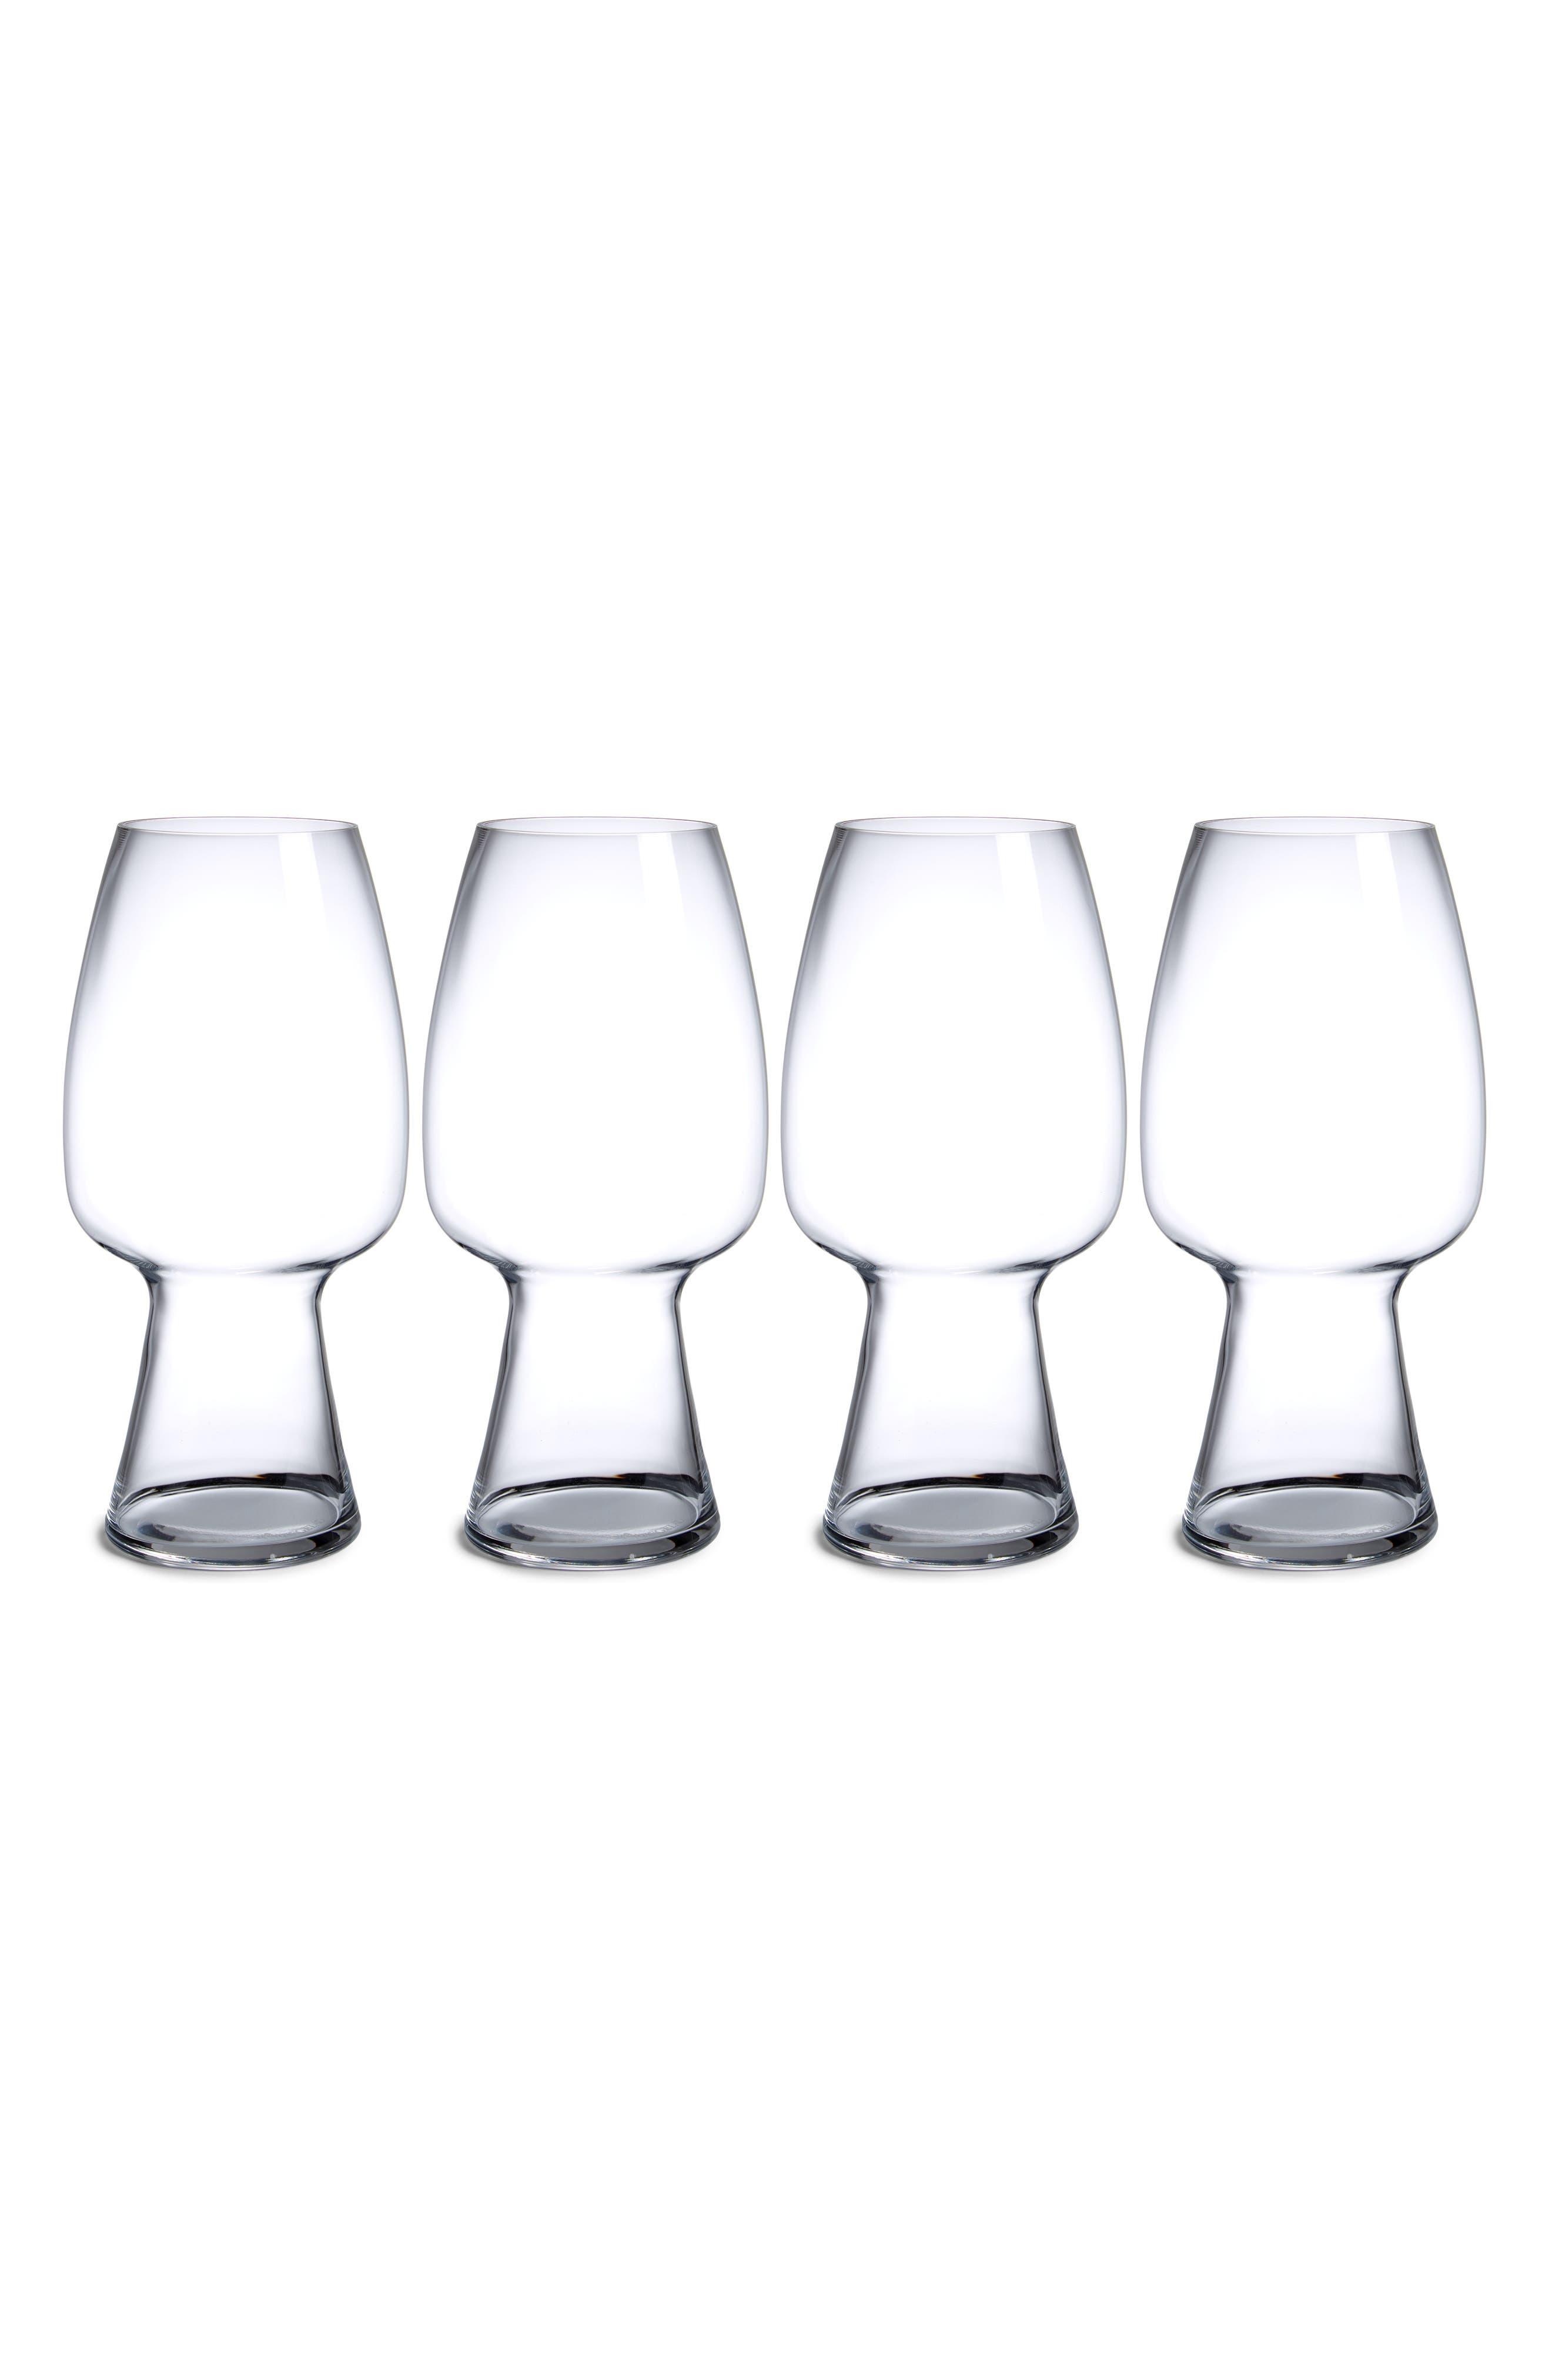 Set of 4 Stout Glasses,                         Main,                         color, Clear